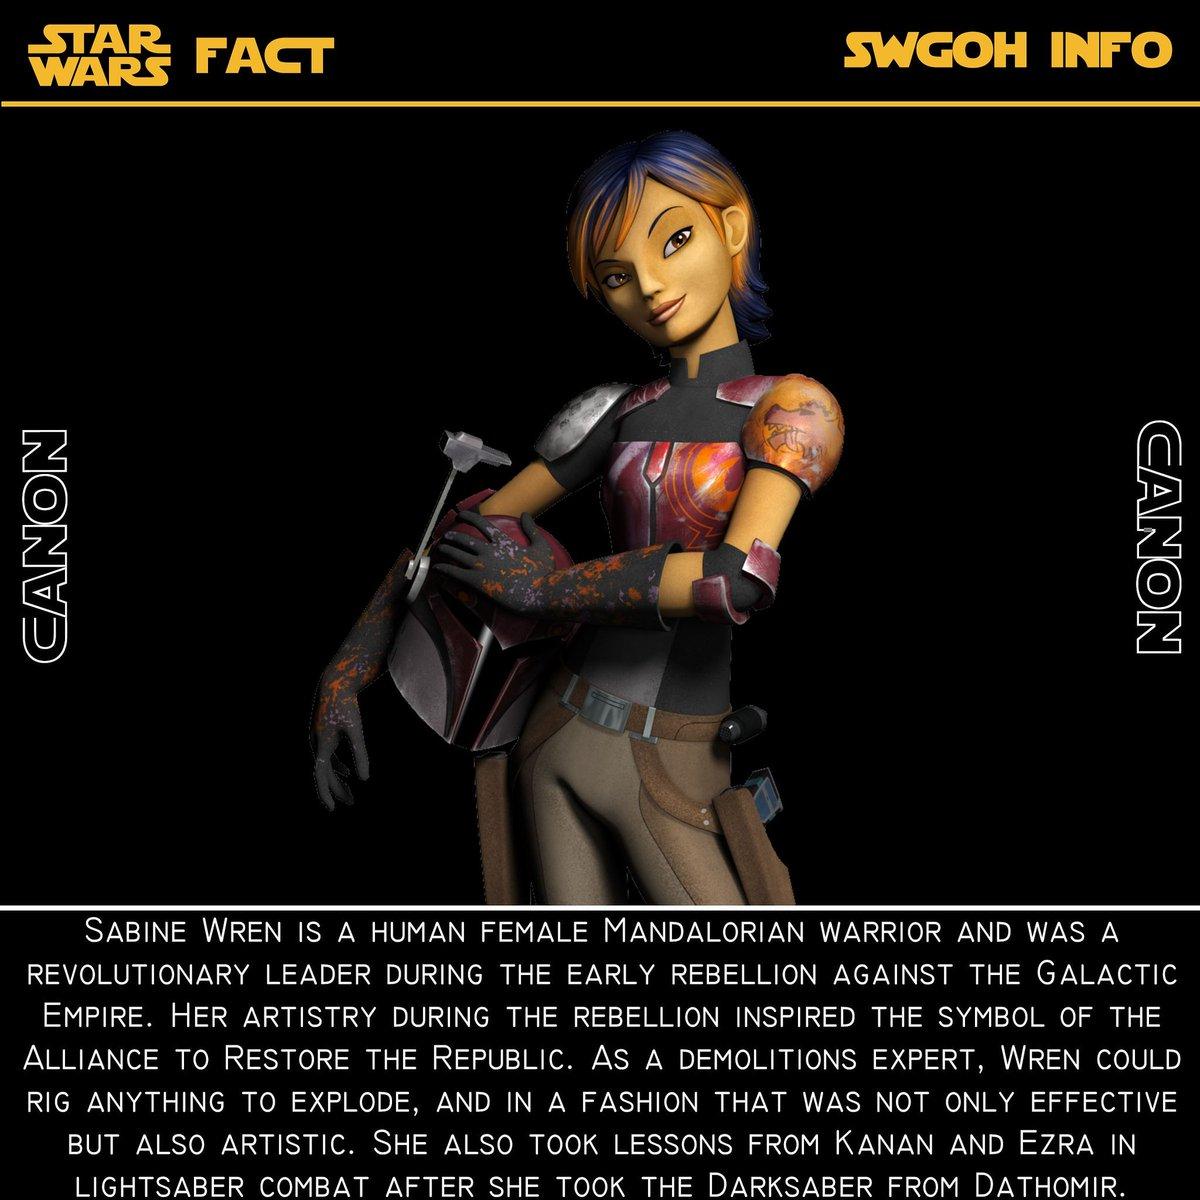 test Twitter Media - Fact #26 Sabine Wren - An artist, explosives expert and the Mandalorian Warrior #starwars #swgoh #galaxyofheroes #starwarsfact #swfact #Phoenix #rebels #sabinewren https://t.co/rqrMu9EF1s